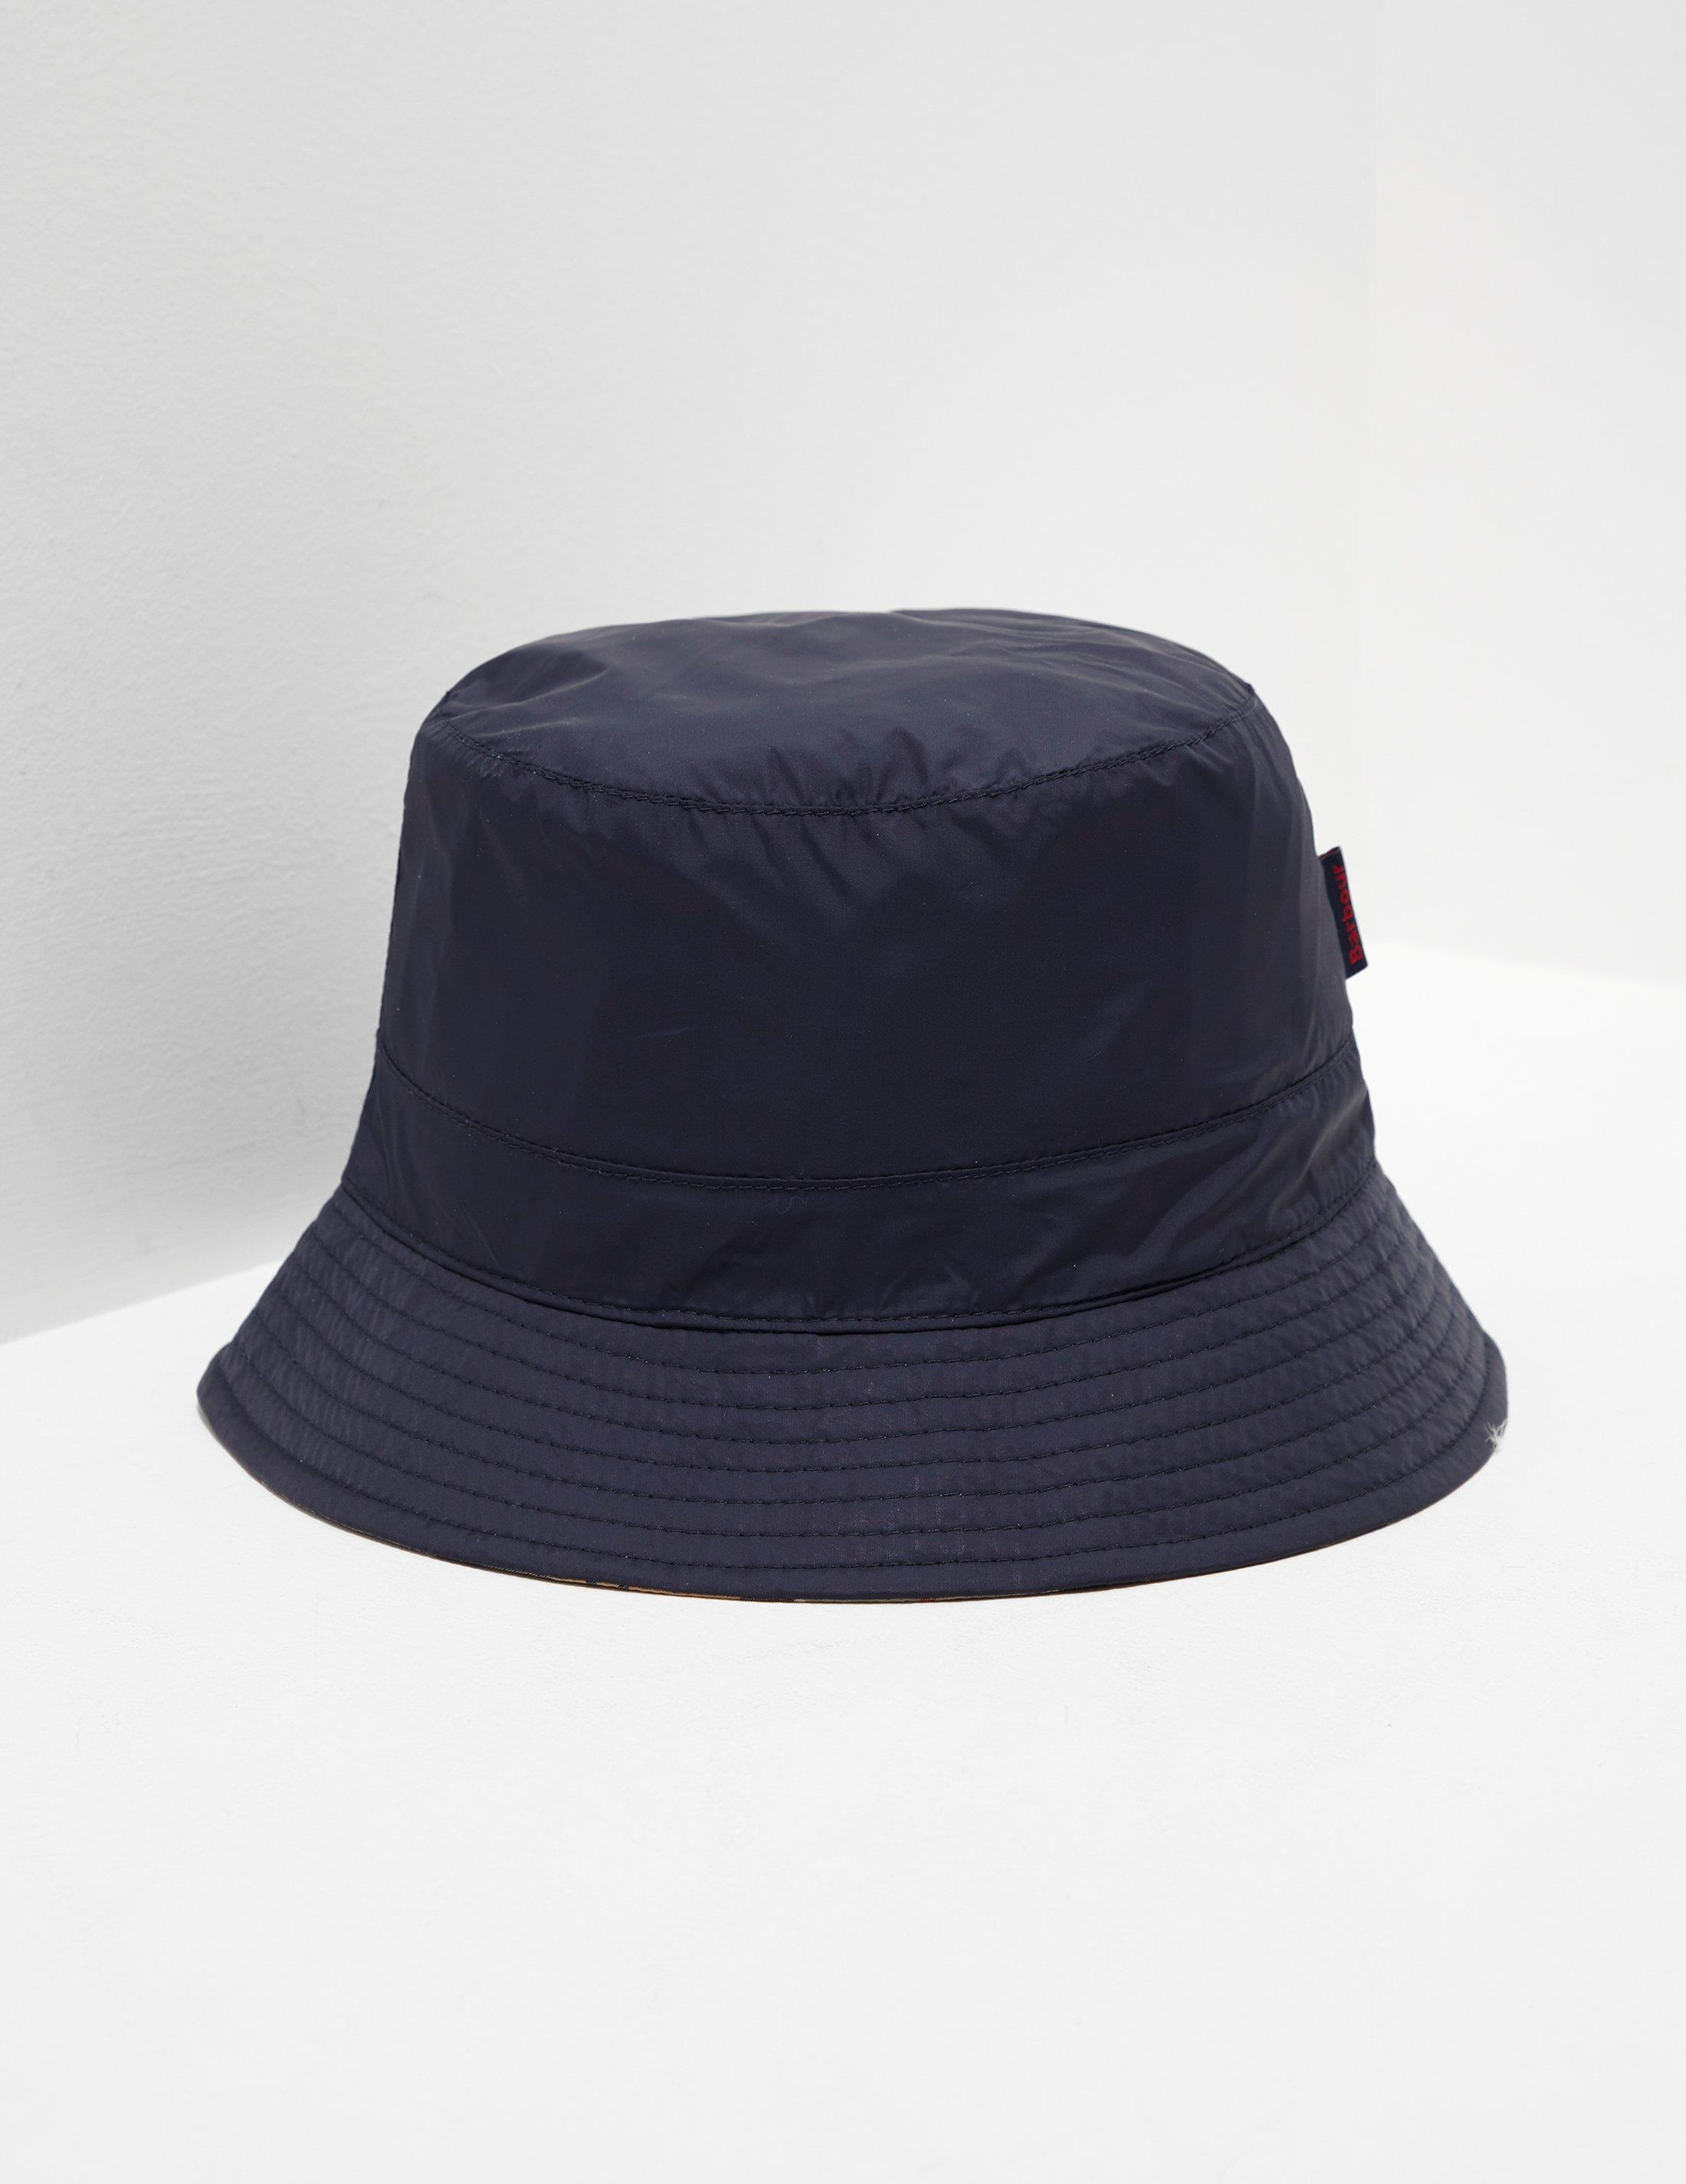 cd4f2d39 Barbour Mens Reverse Tartan Bucket Hat Navy Blue in Blue for Men - Lyst